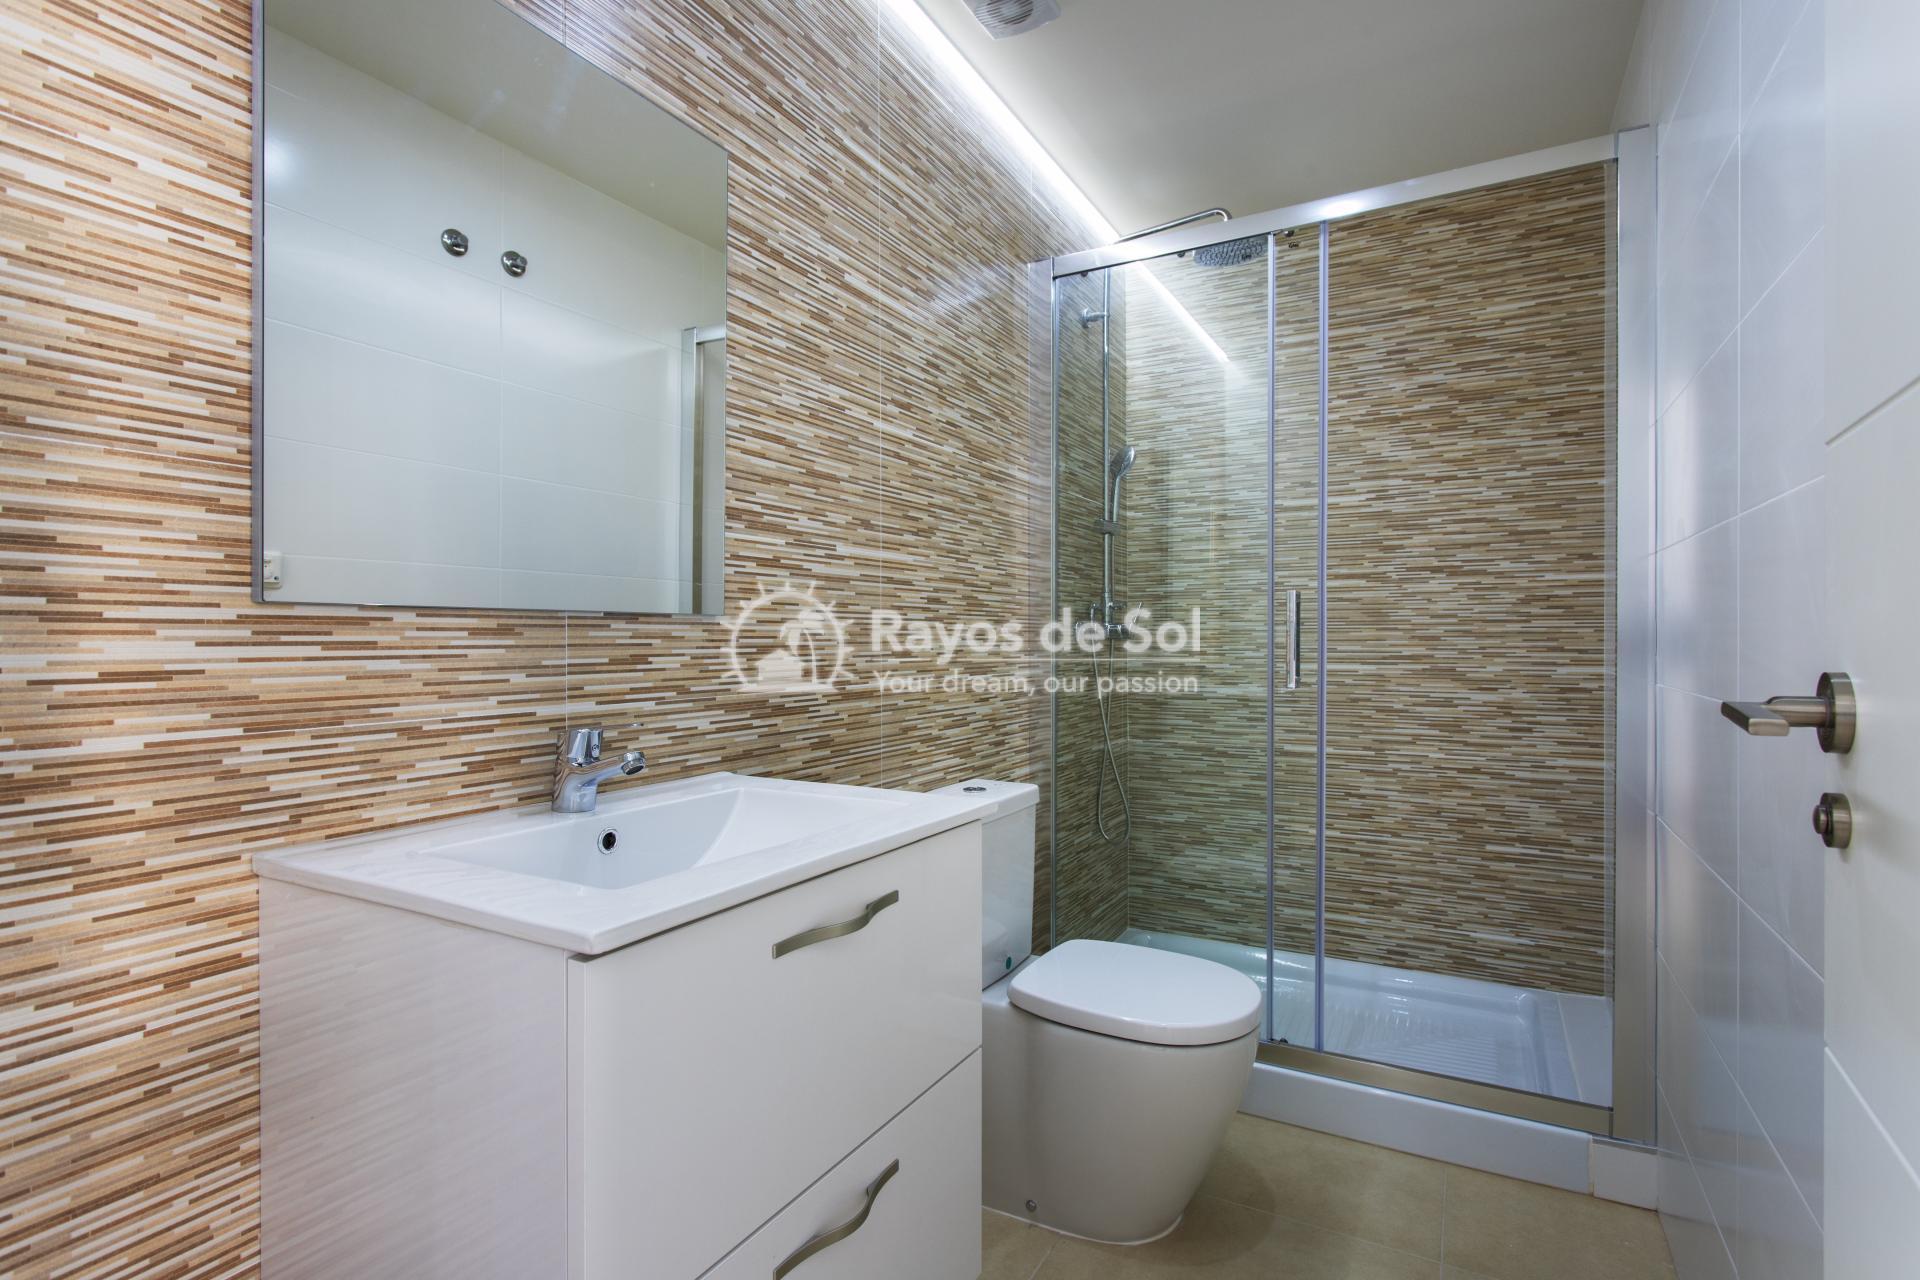 Appartement begane grond  in La Florida, Orihuela Costa, Costa Blanca (Oasis place BG3-2) - 10